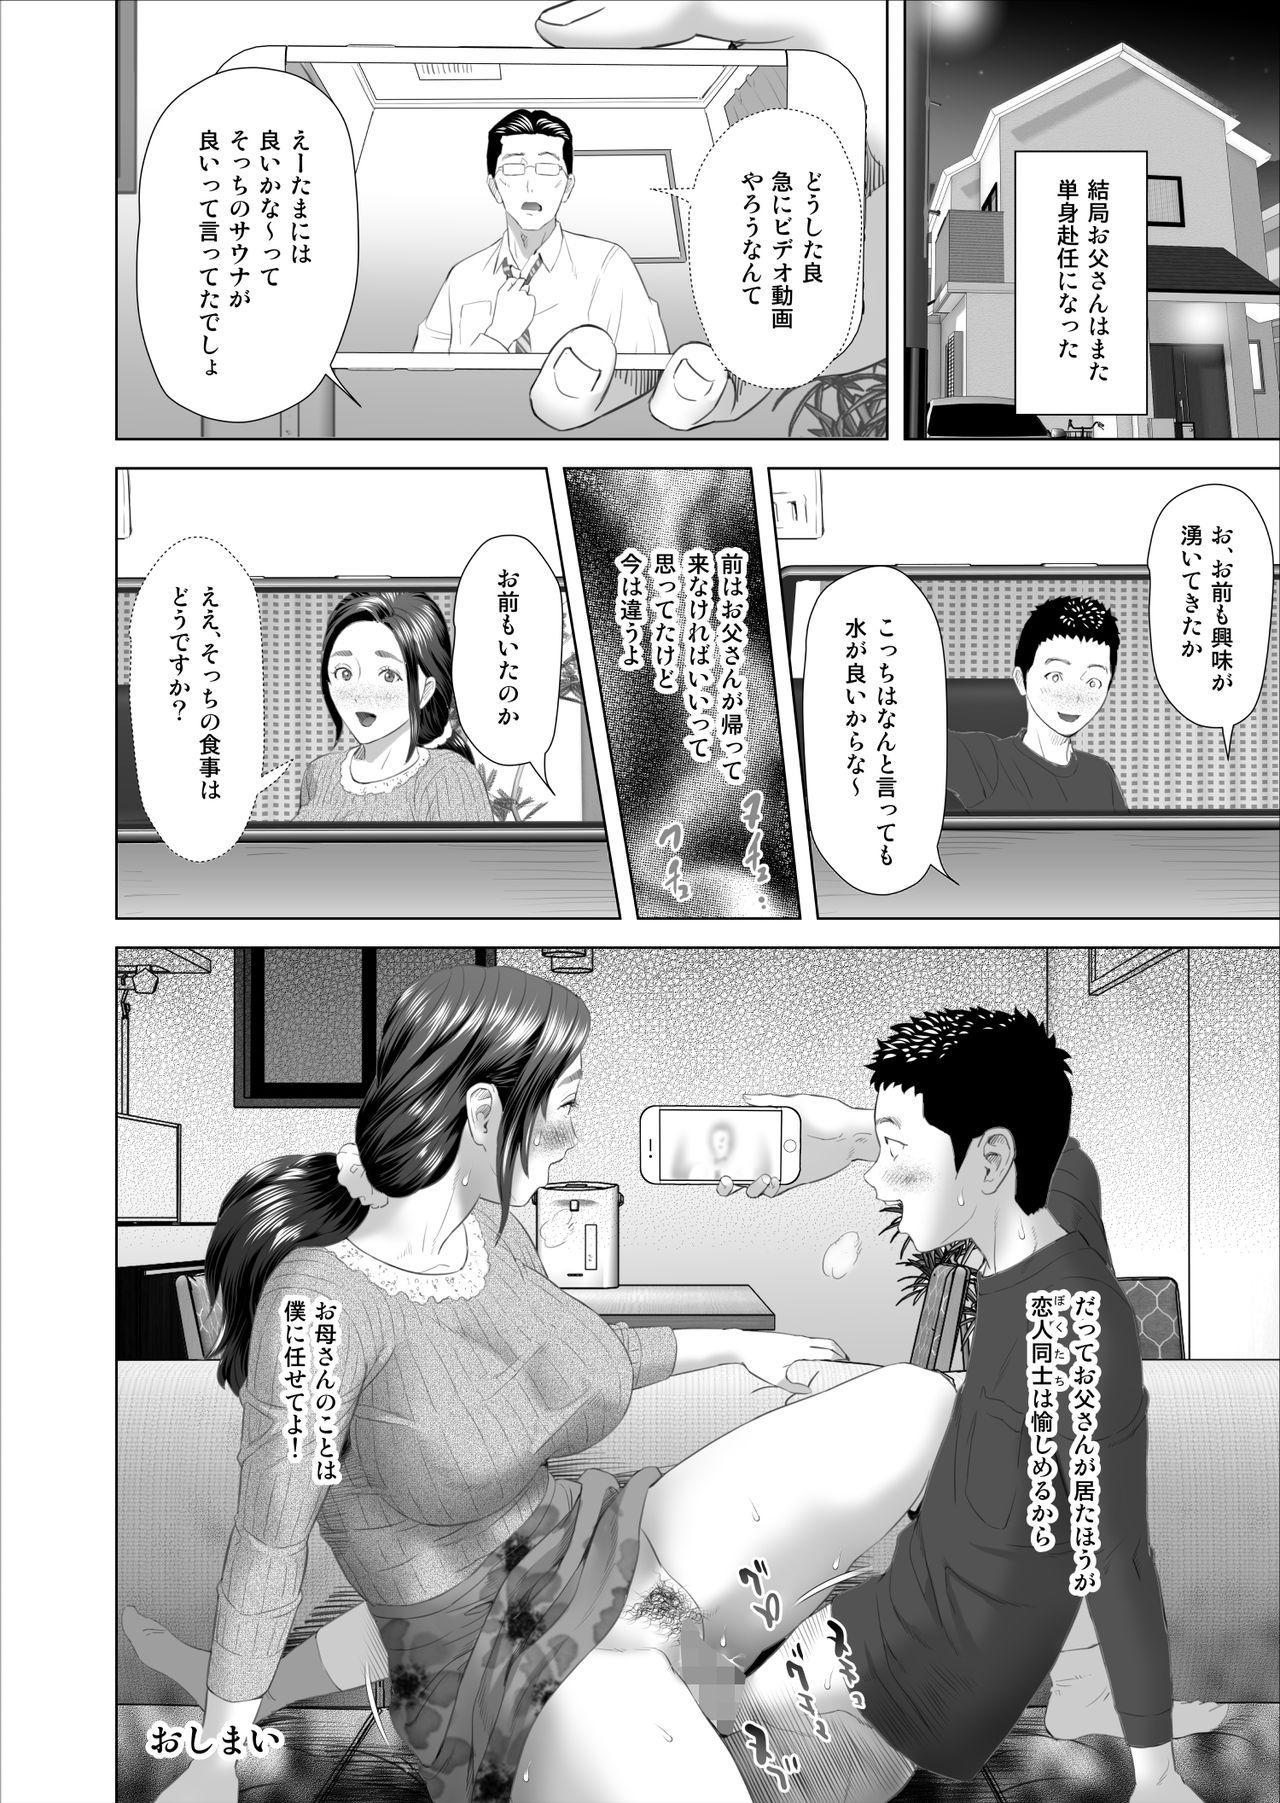 Kinjo Yuuwaku Musuko o Yobai ni Sasou Haha Hen | Neighborhood Seduction Mother Lures Son for a Night Visit! 253